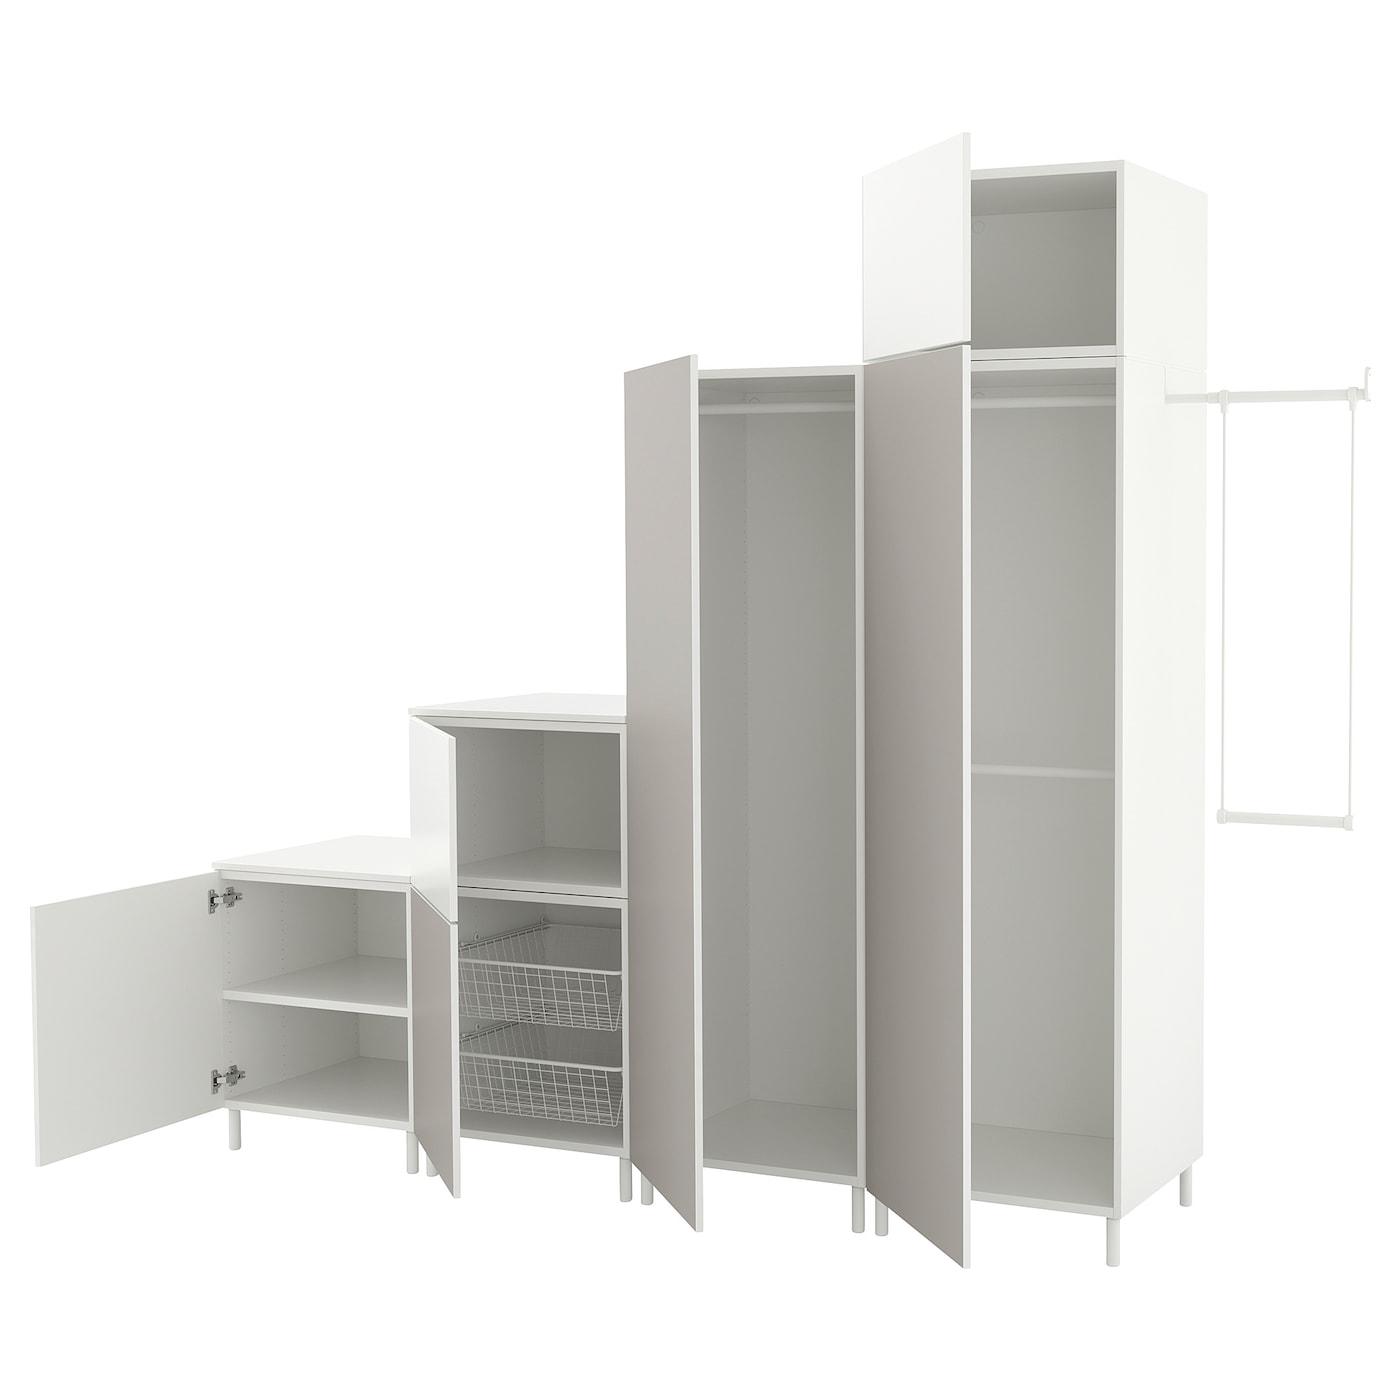 Modular Wardrobes Platsa Wardrobes Ikea